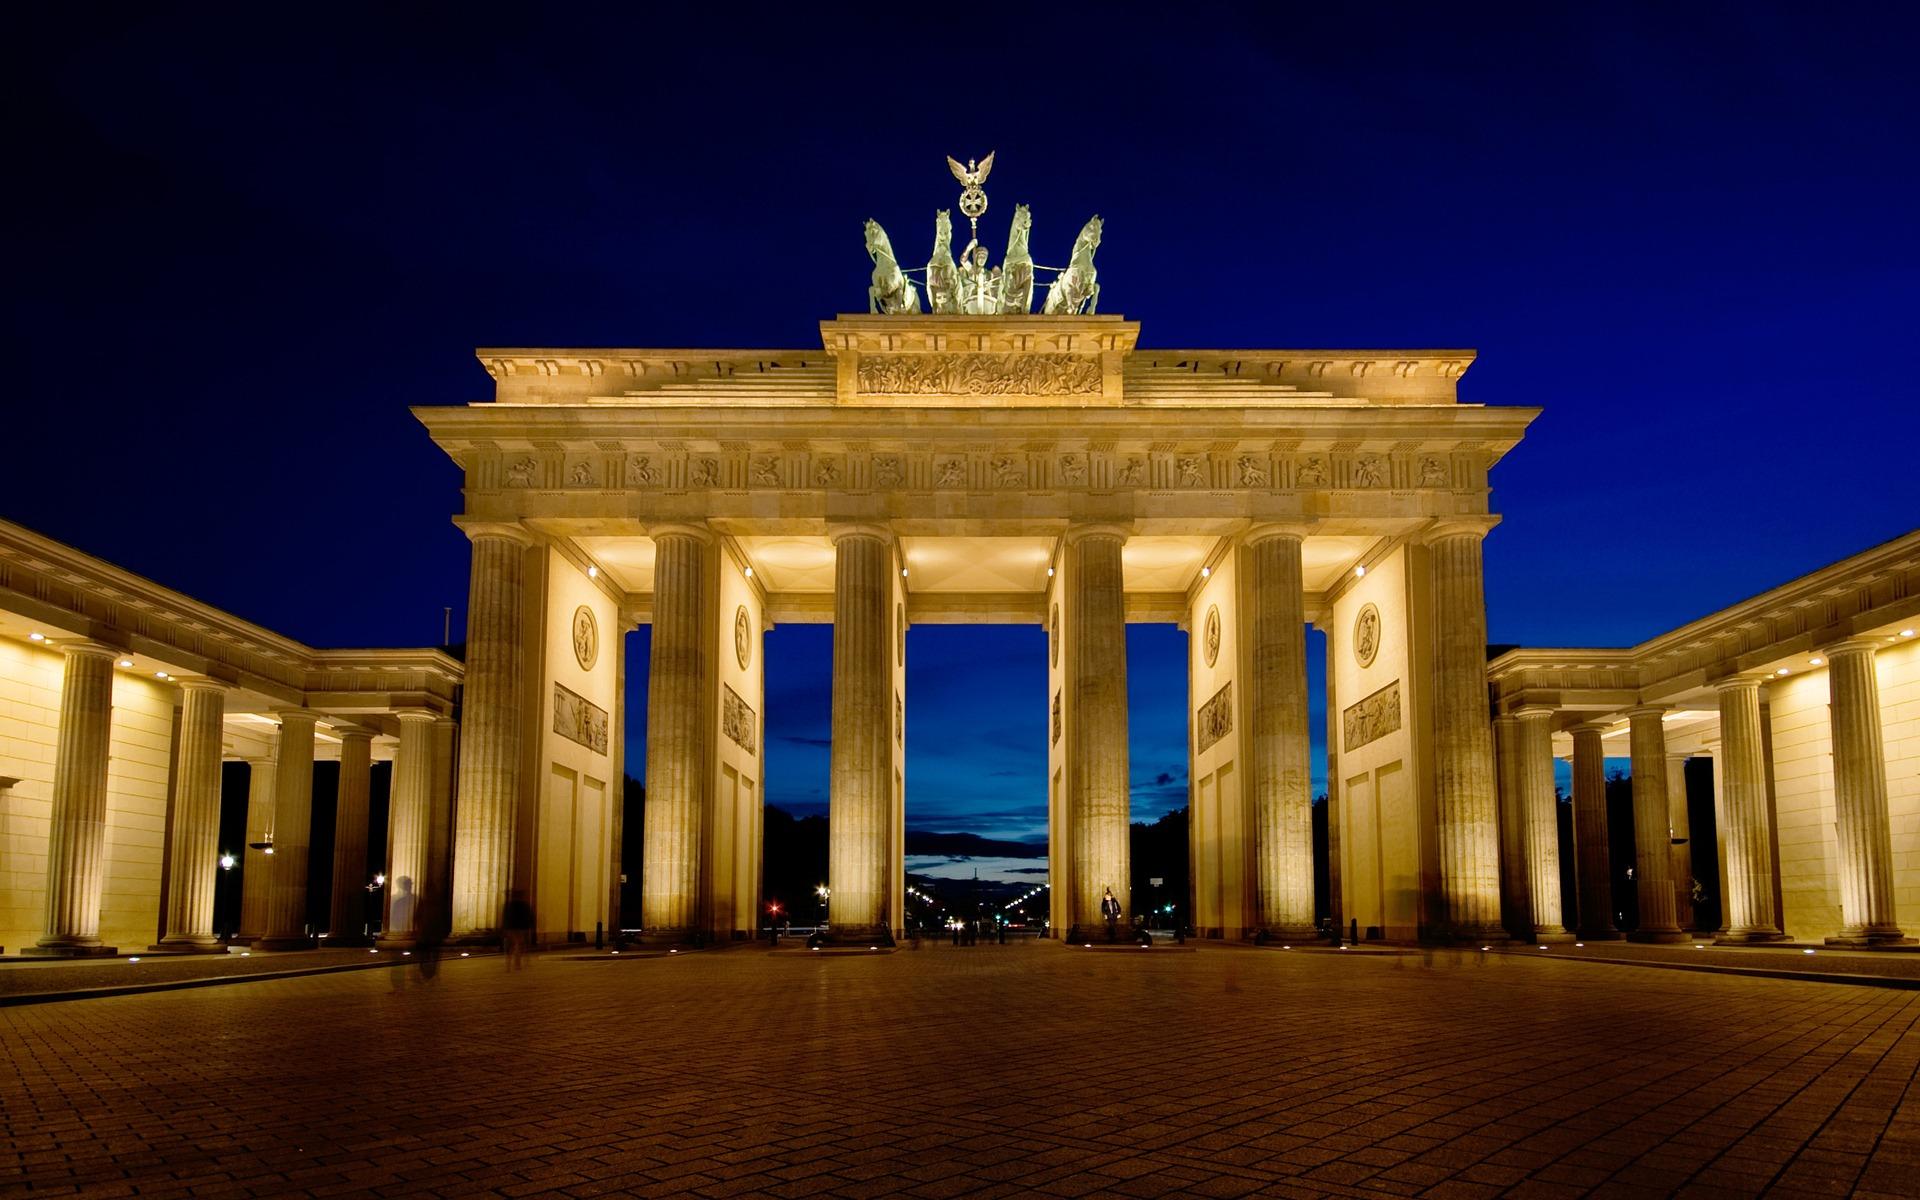 Brandenburg Gate Wallpaper Germany World Wallpapers in jpg format 1920x1200